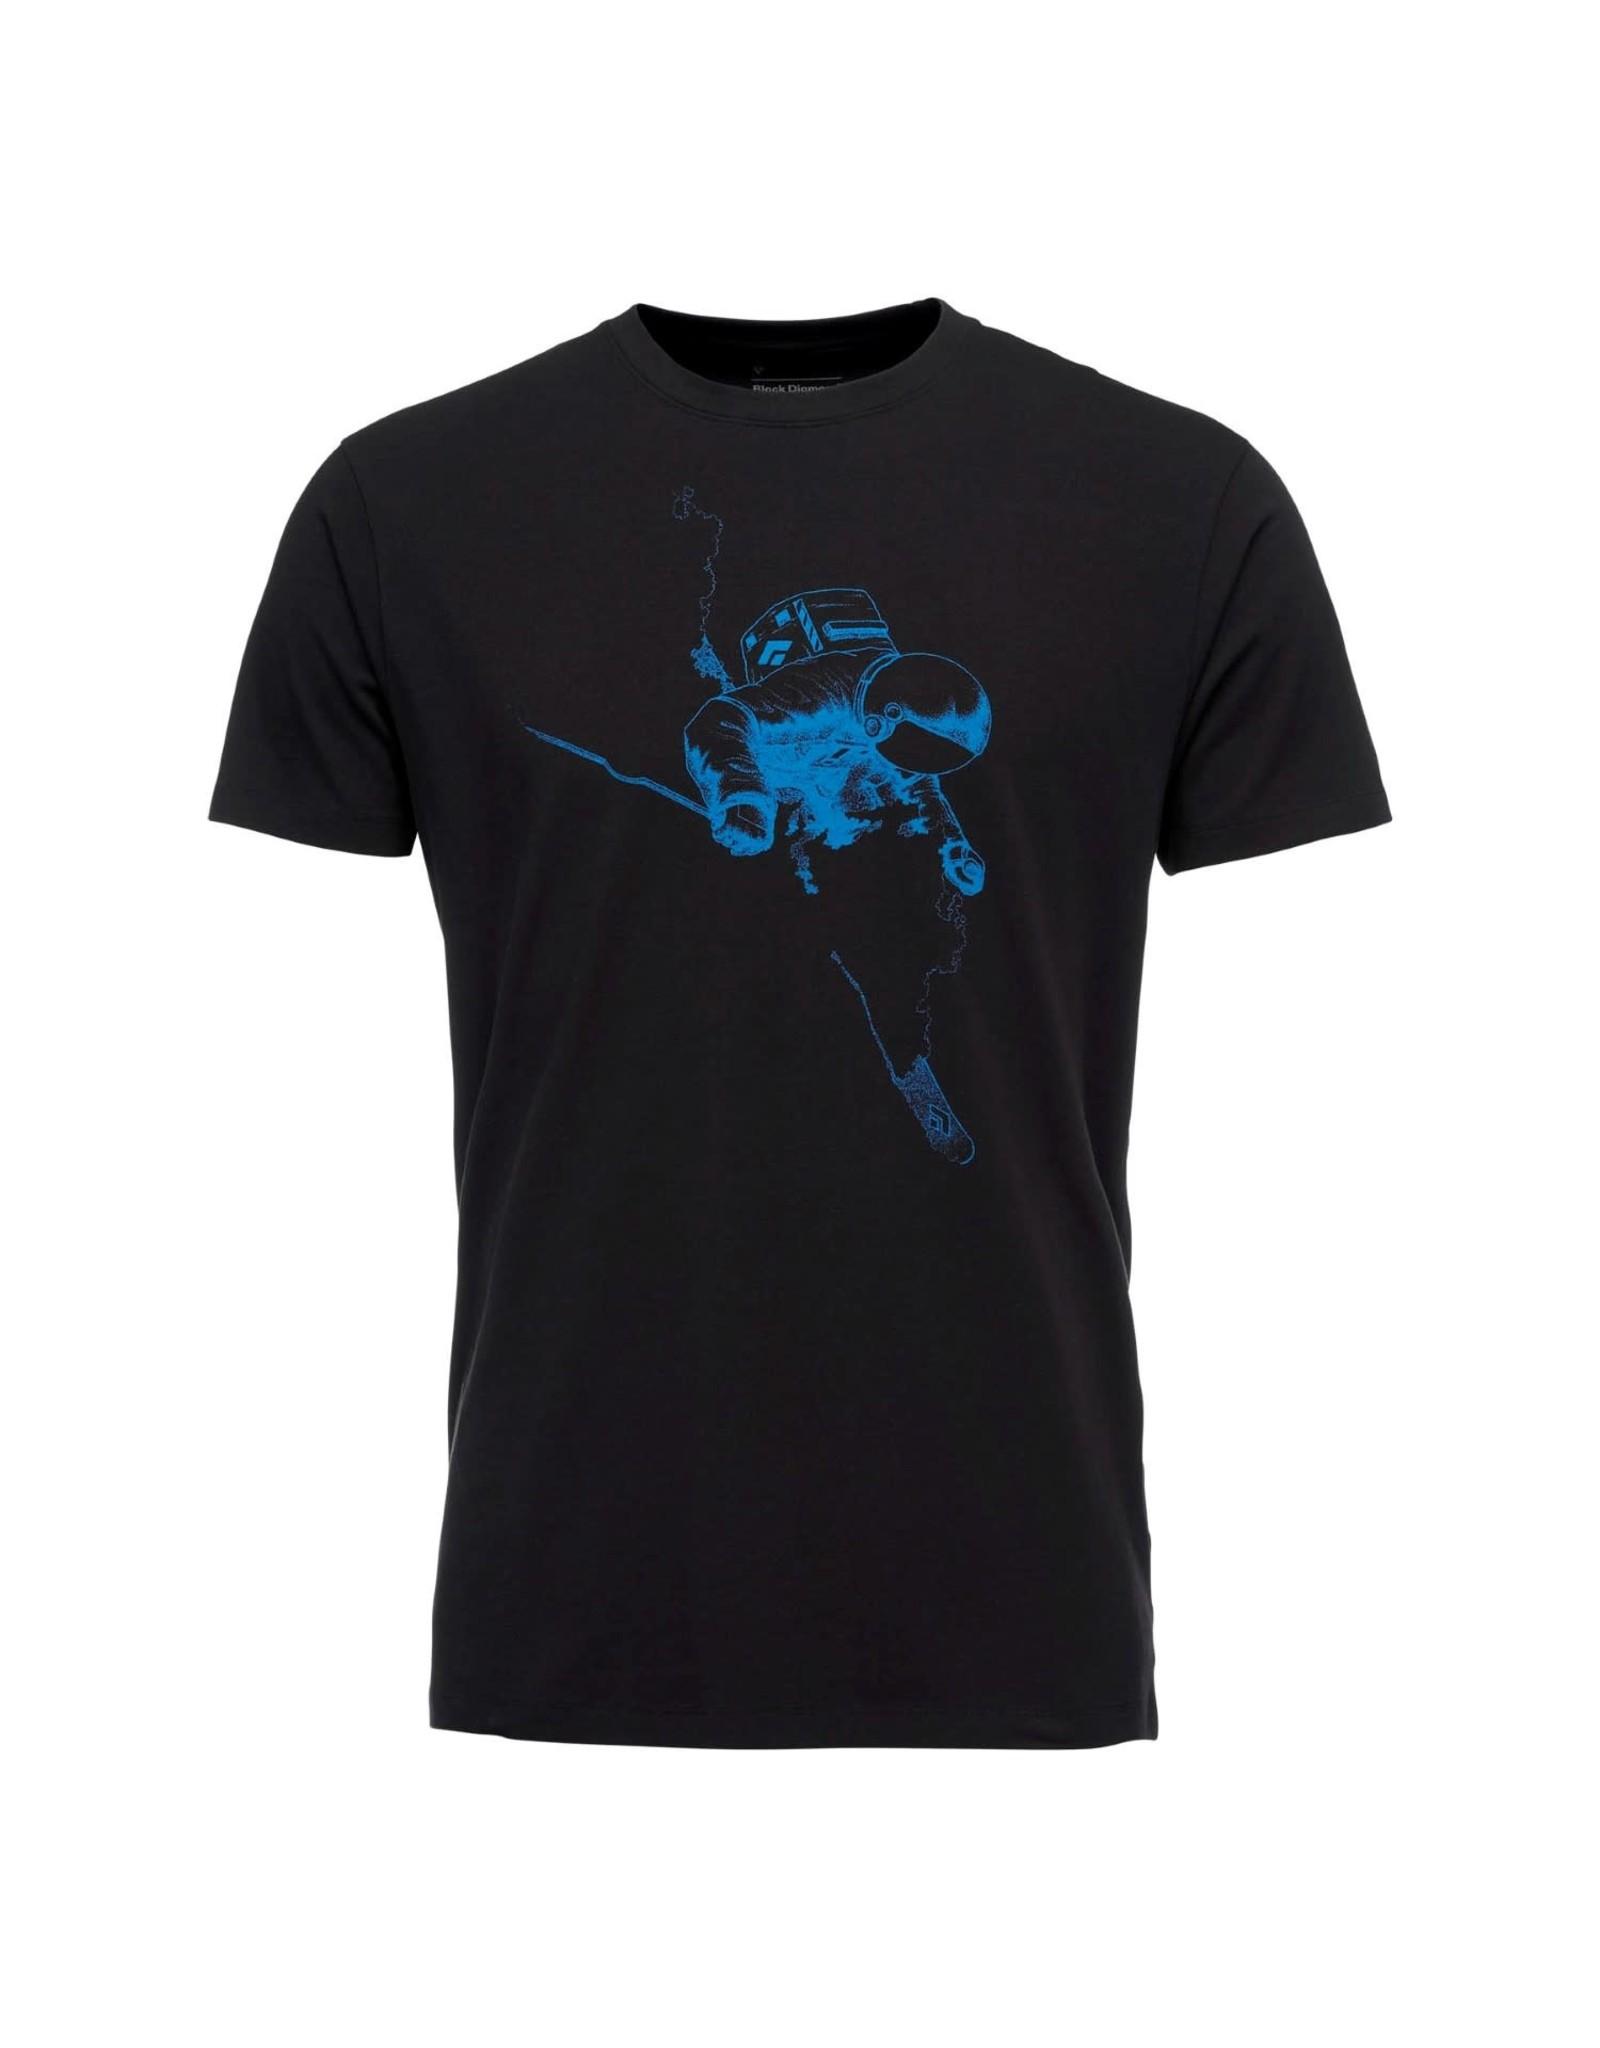 Black Diamond T-Shirt Black Diamond Faceshot Tee - Homme